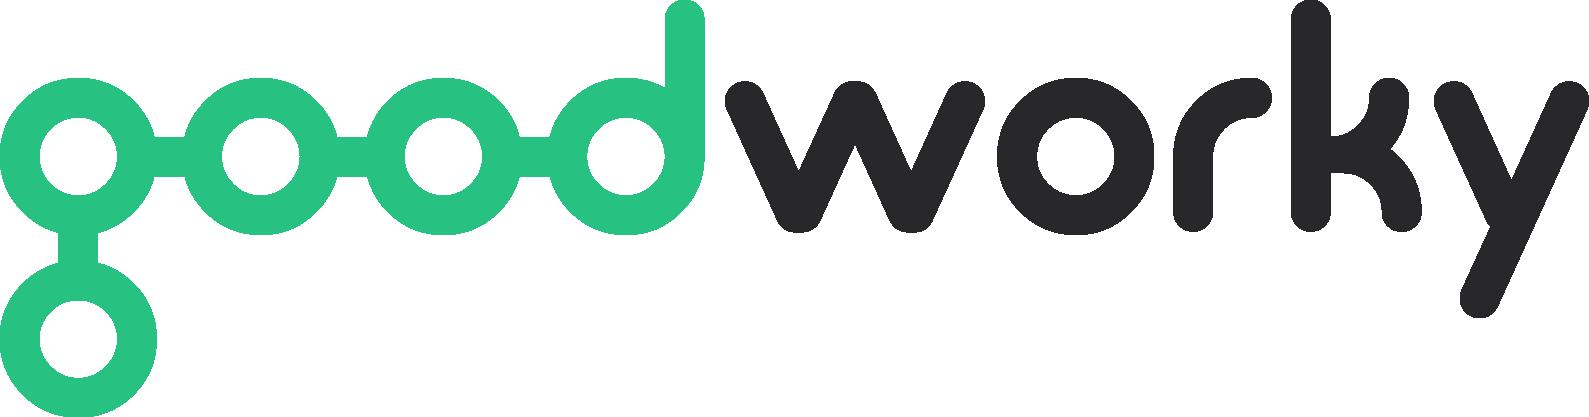 Goodworky - logo